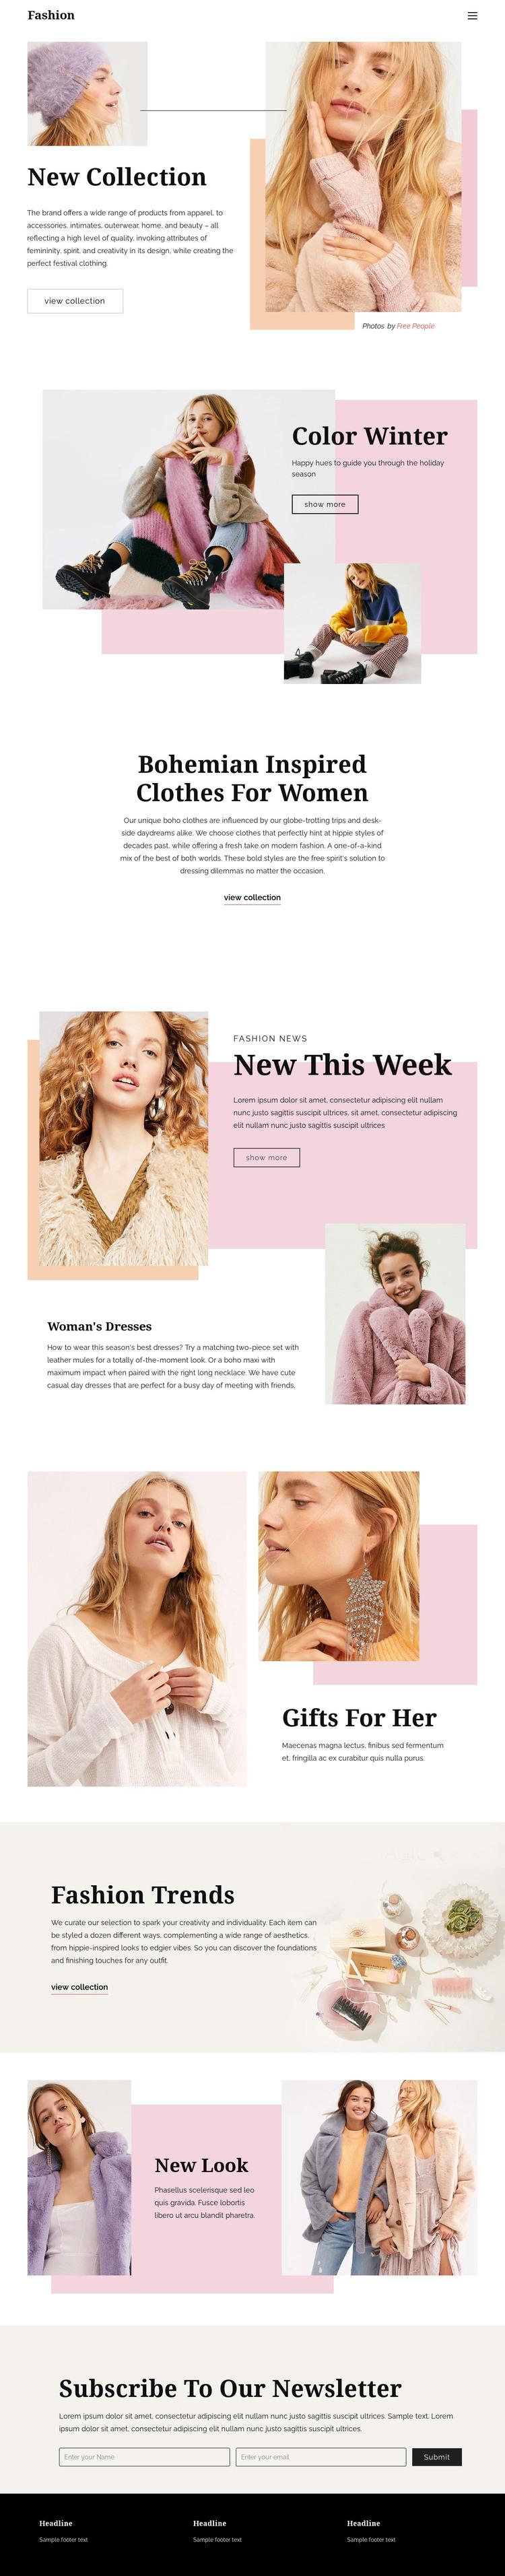 Fashion Page Design Homepage Design